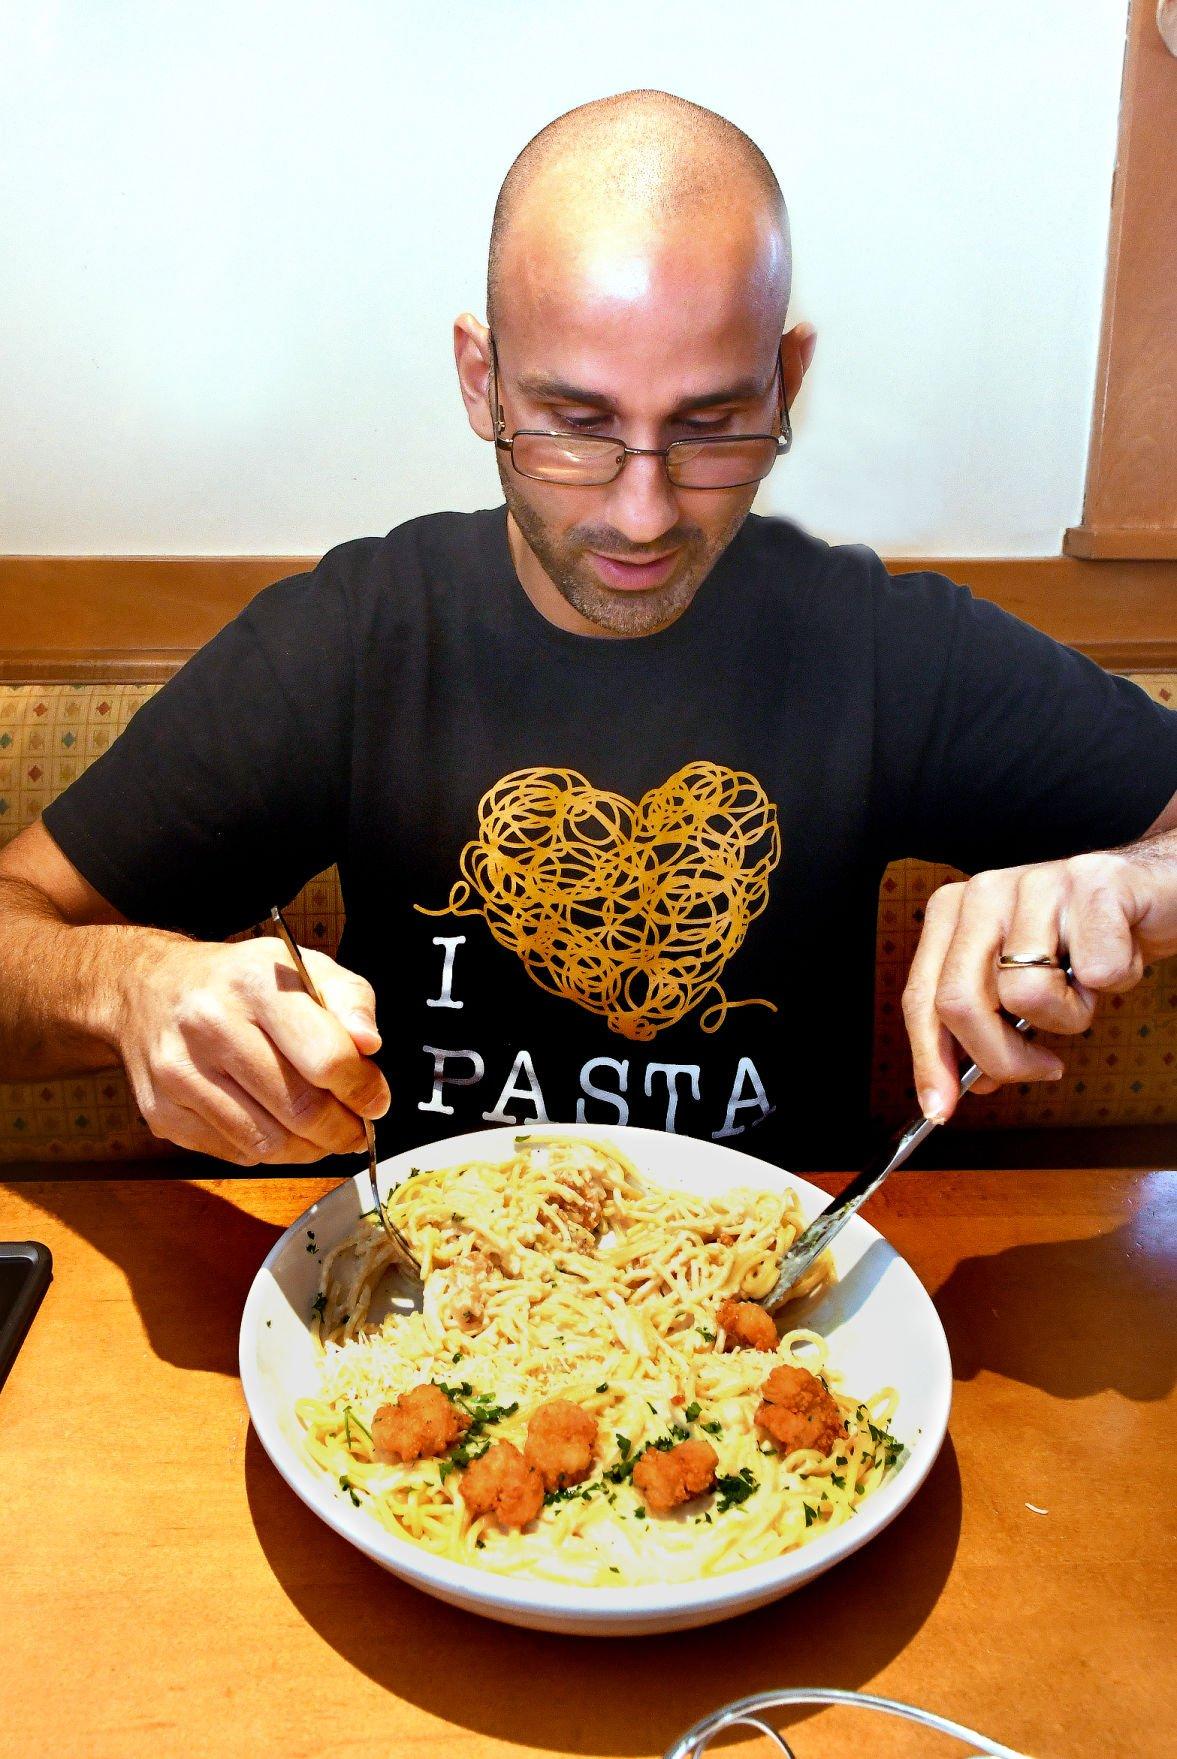 Jeff Berman Pasta Pass Olive Garden